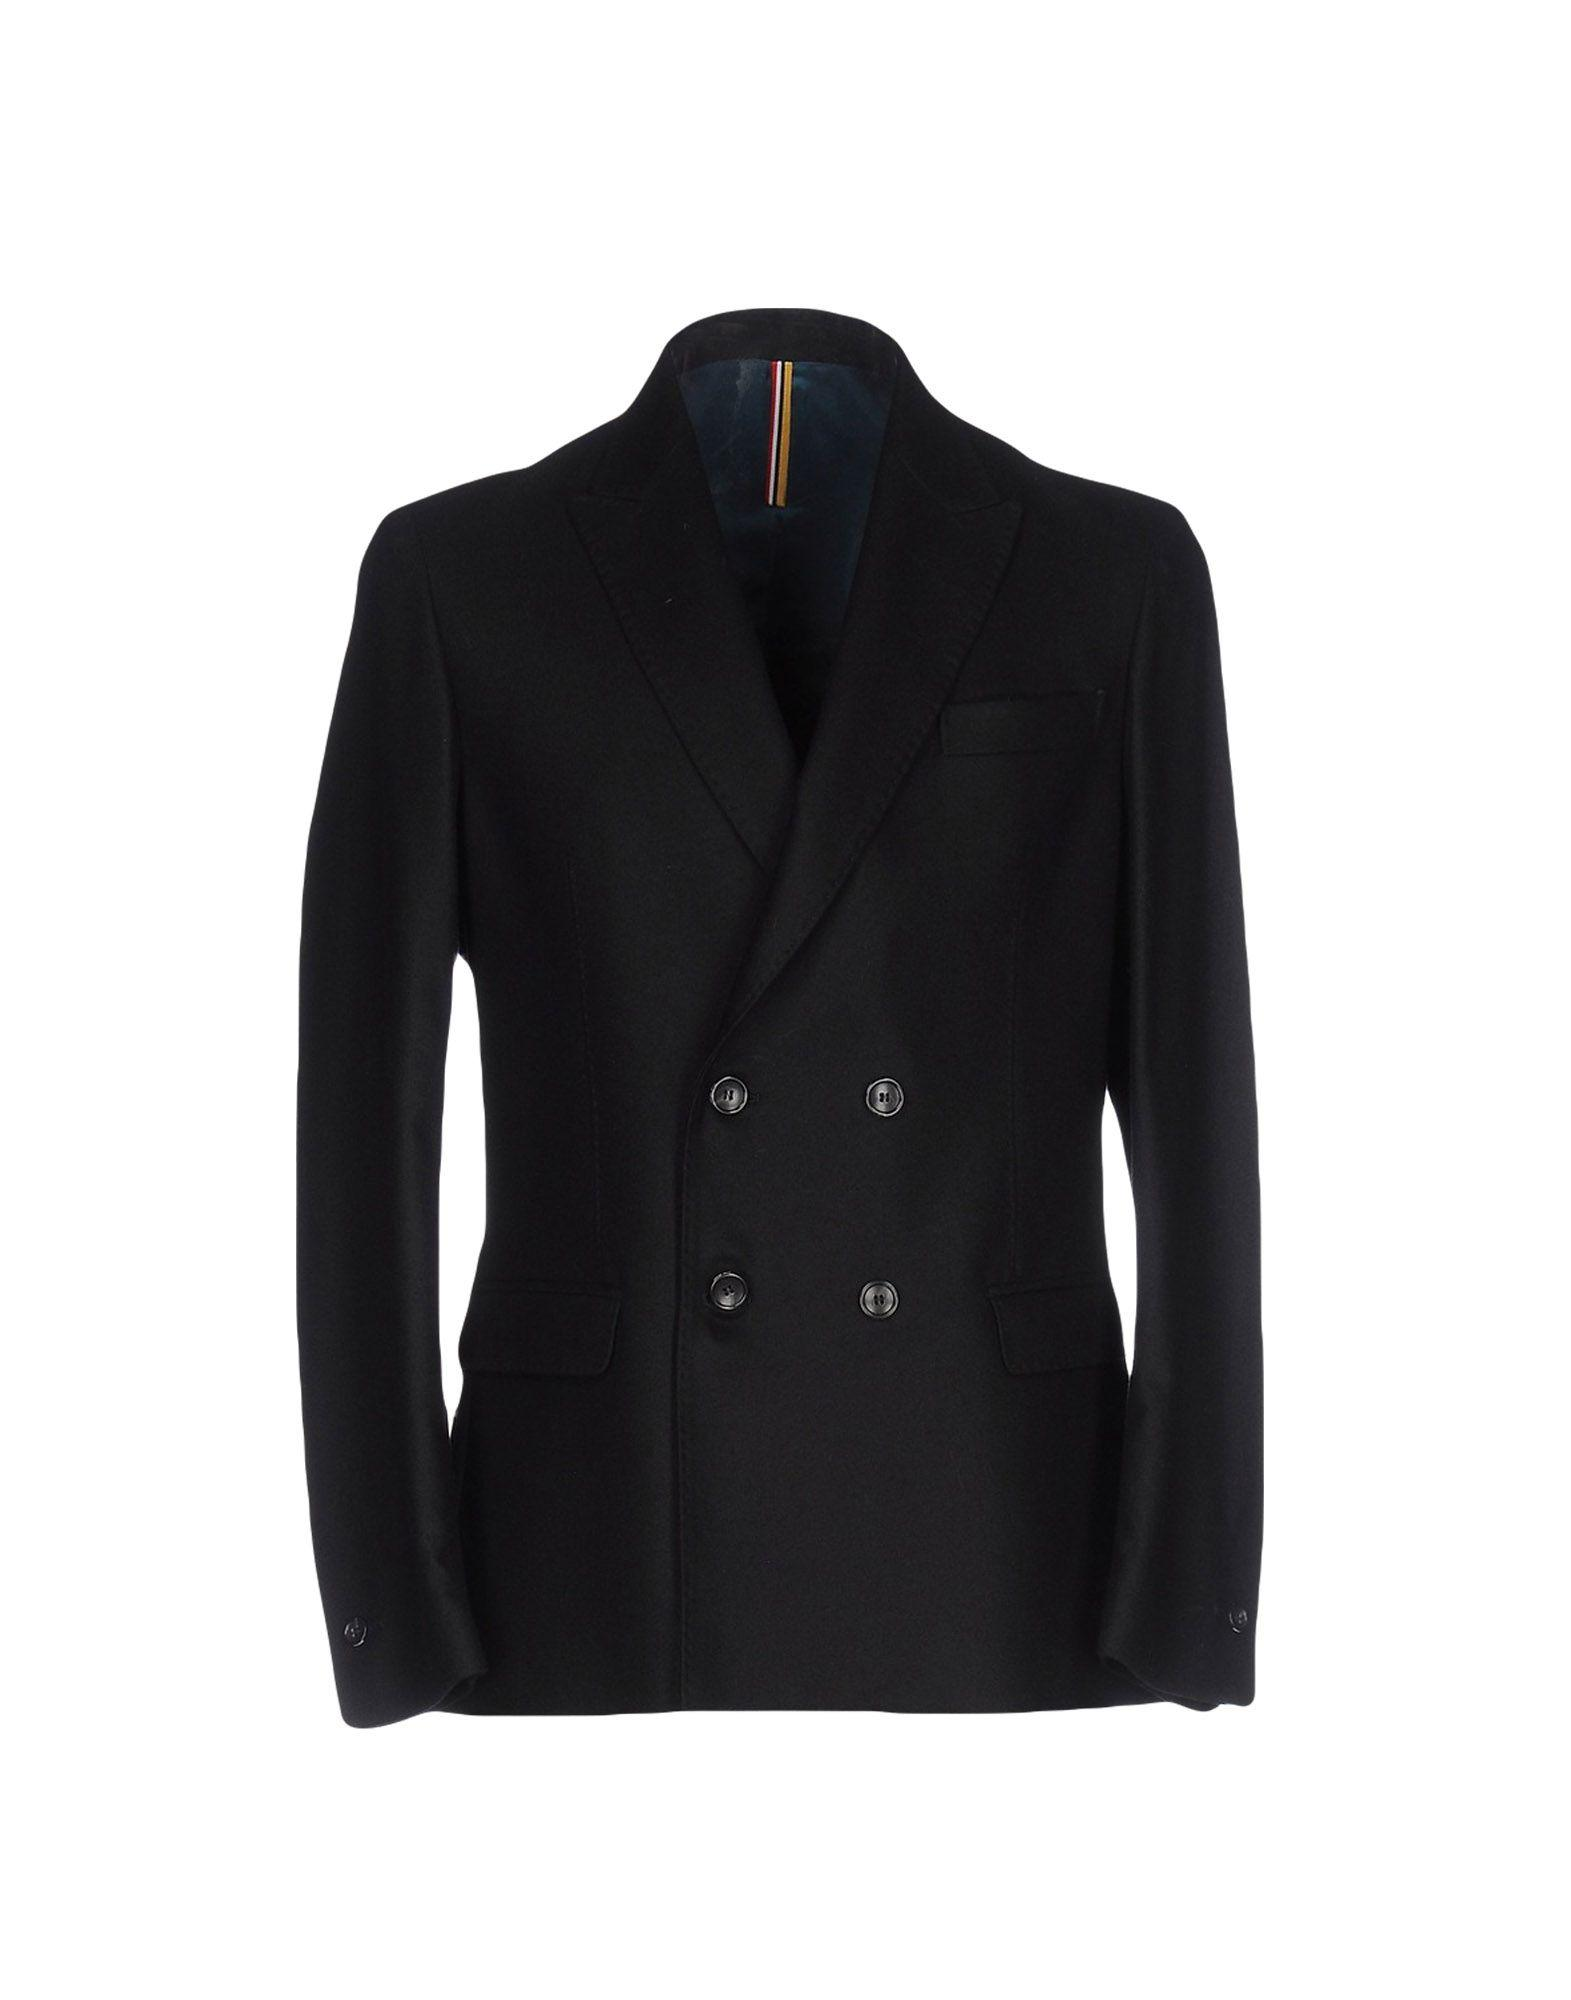 Low Brand Blazer In Black